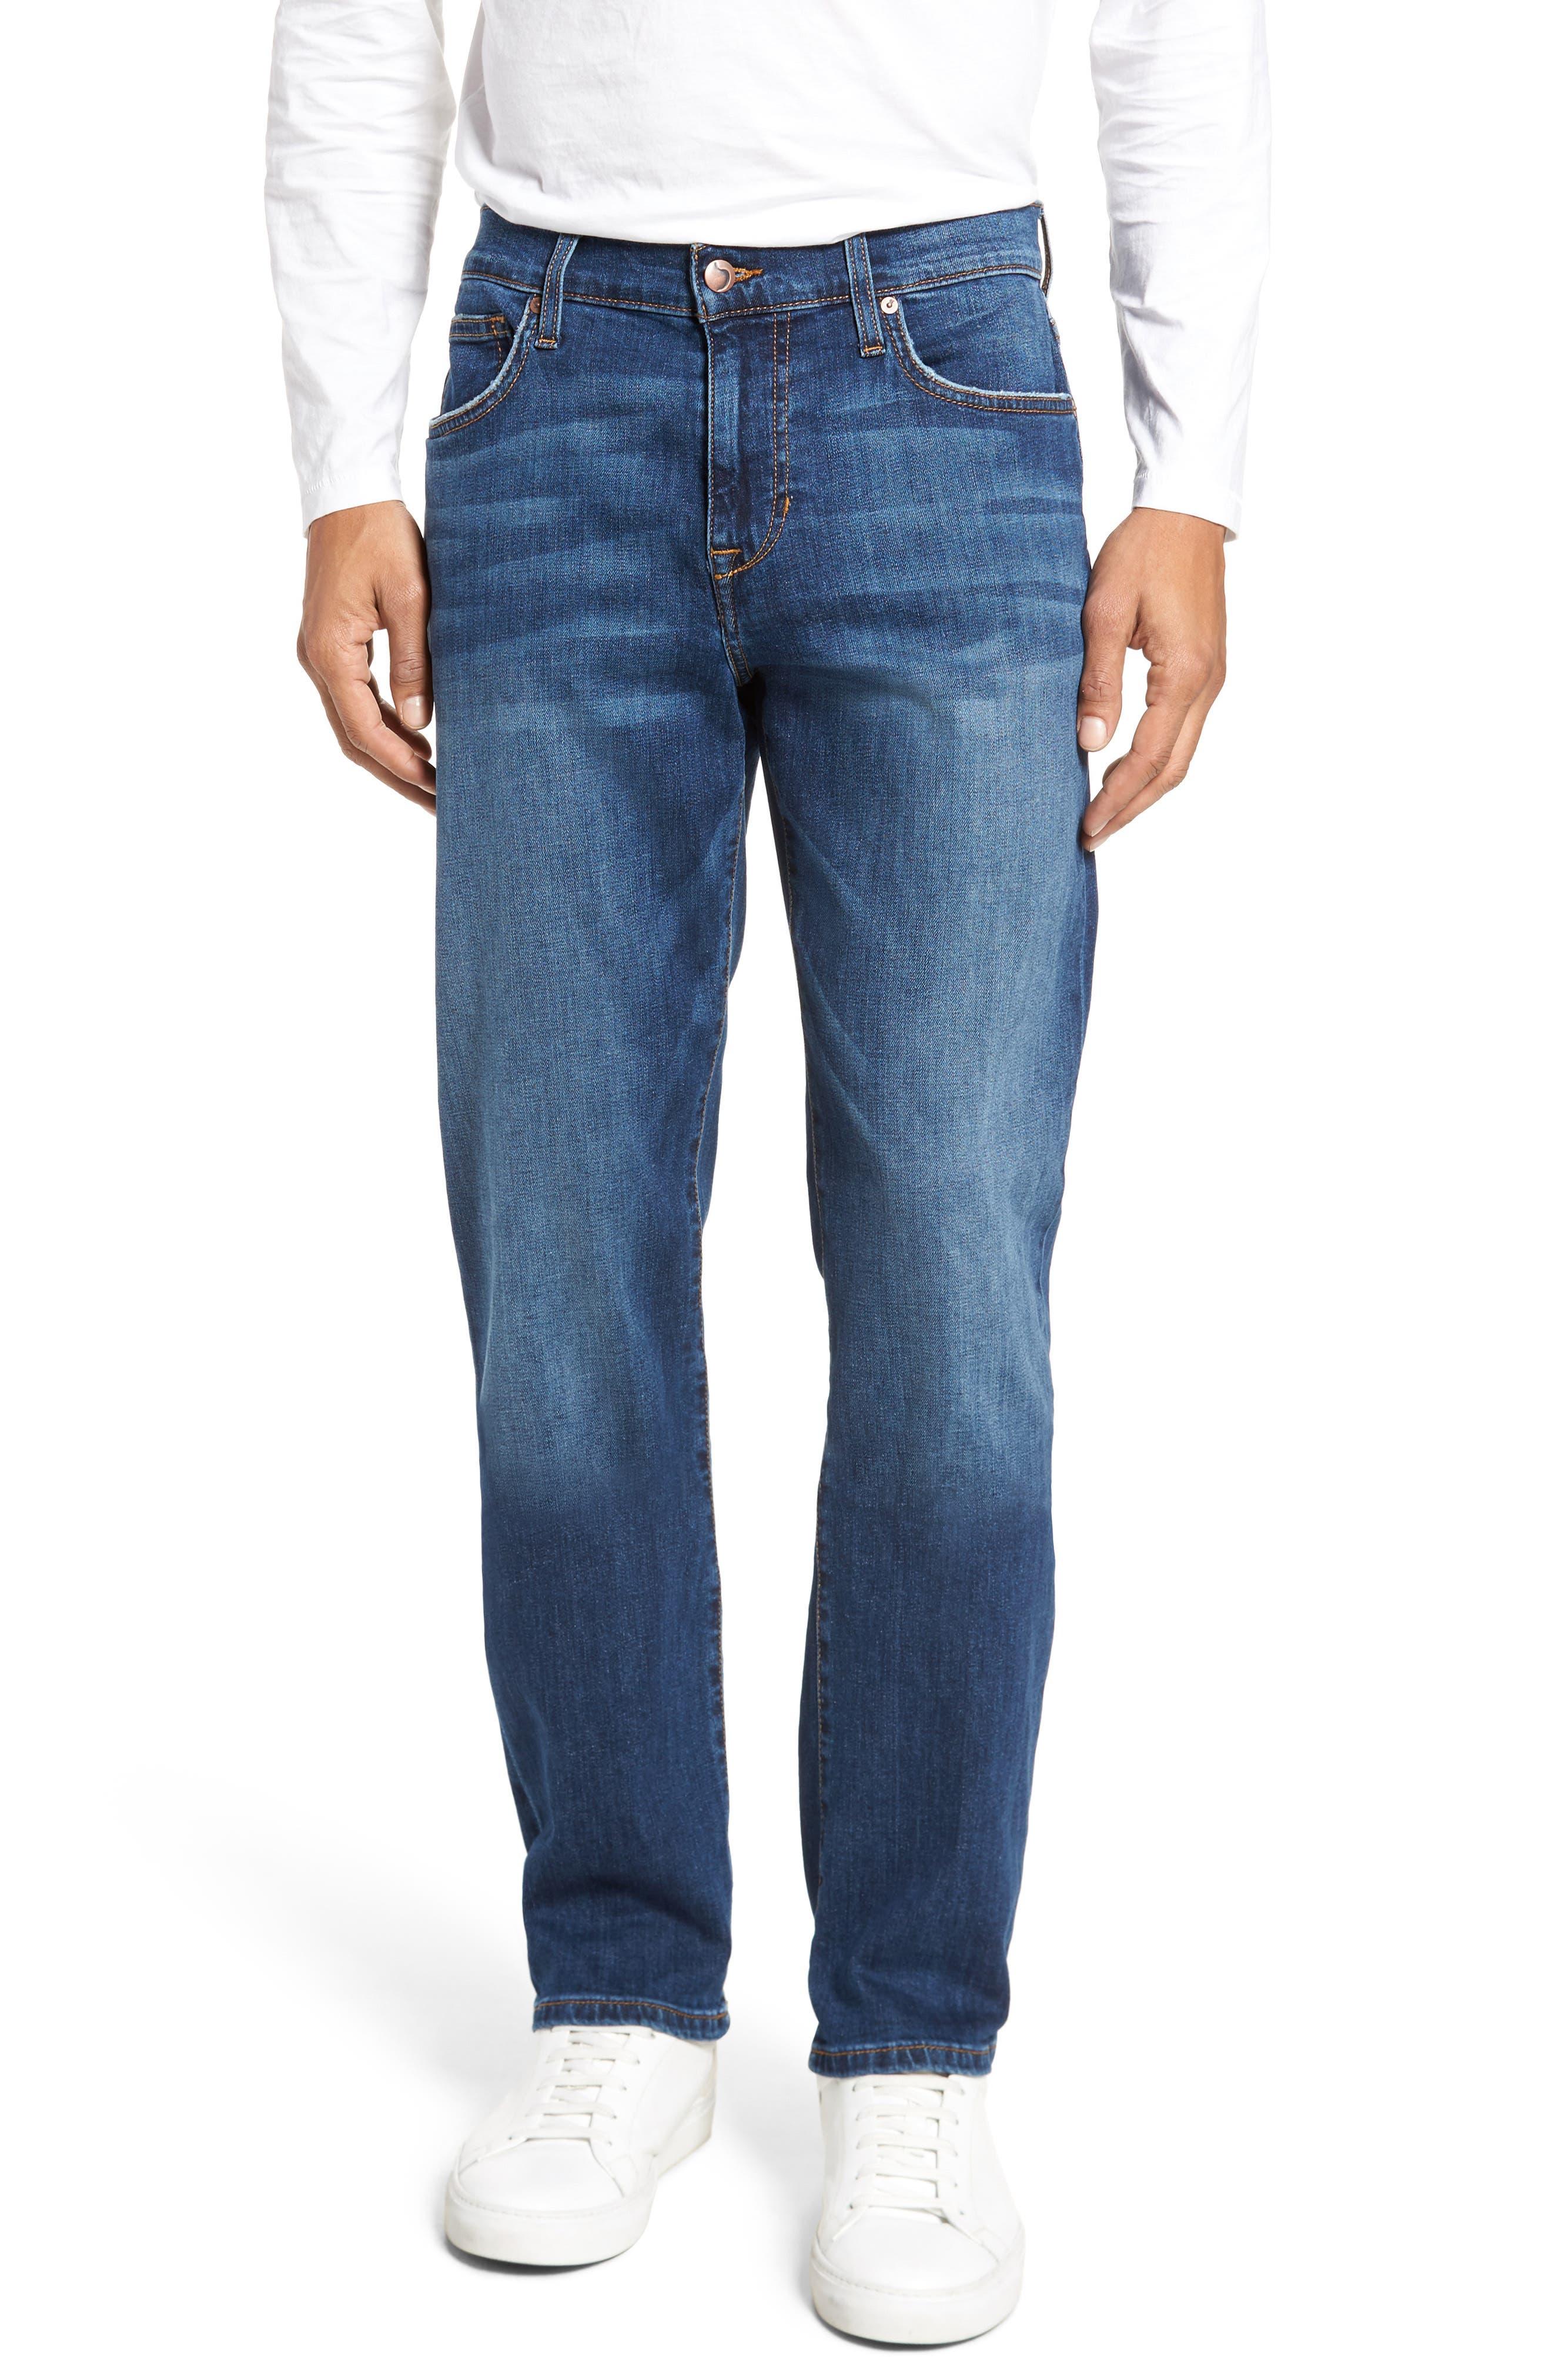 Brixton Slim Straight Fit Jeans,                         Main,                         color, Bradlee